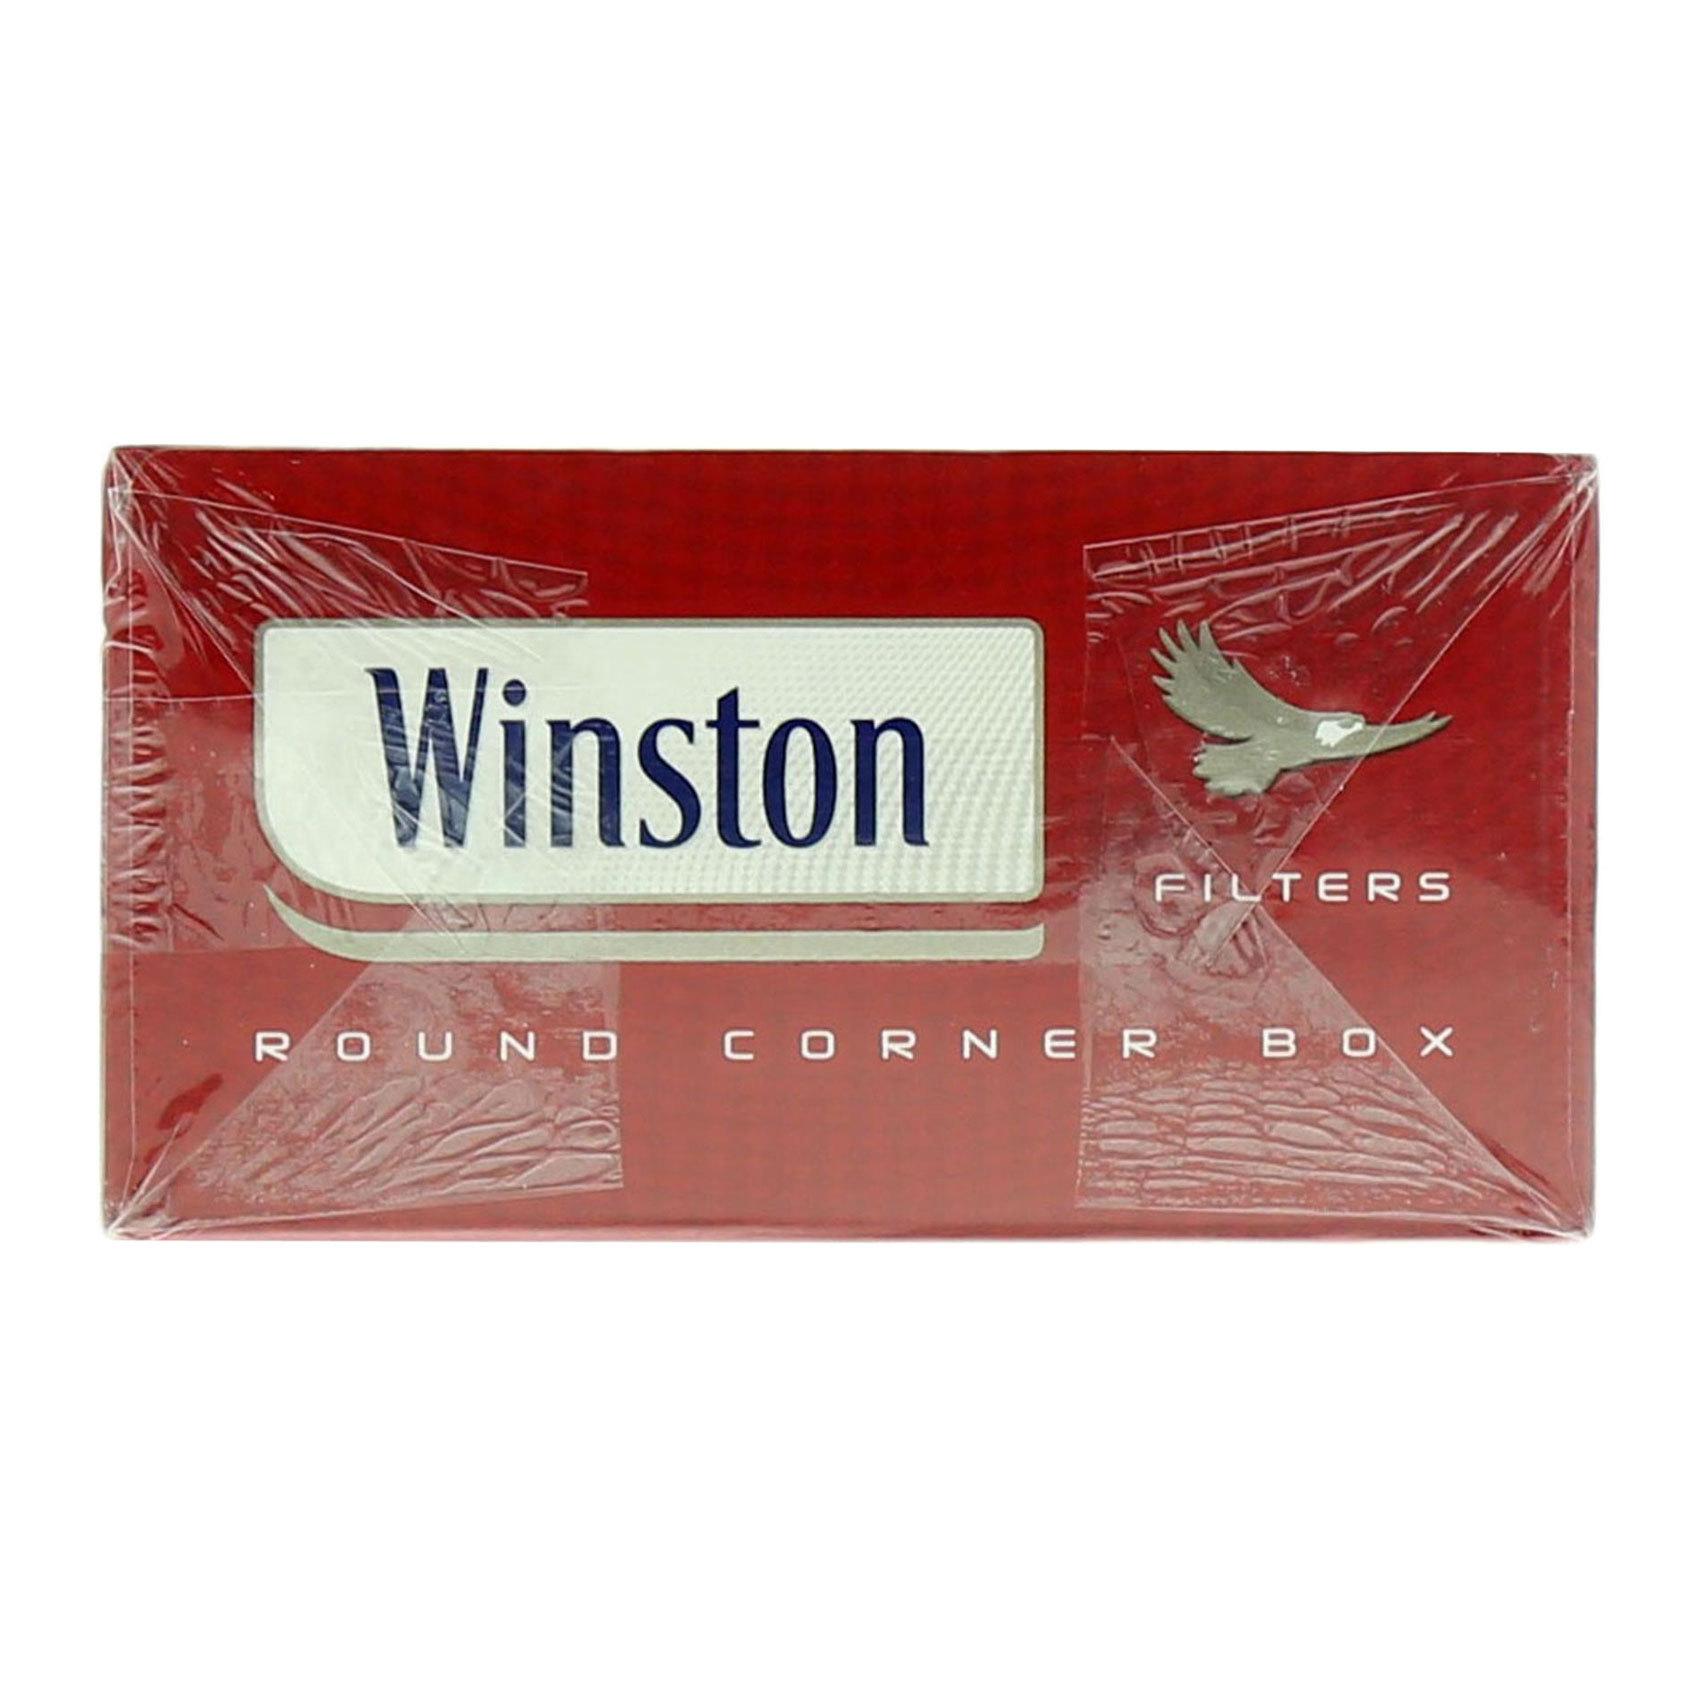 WINSTON FILTER KING SIZE 20X10